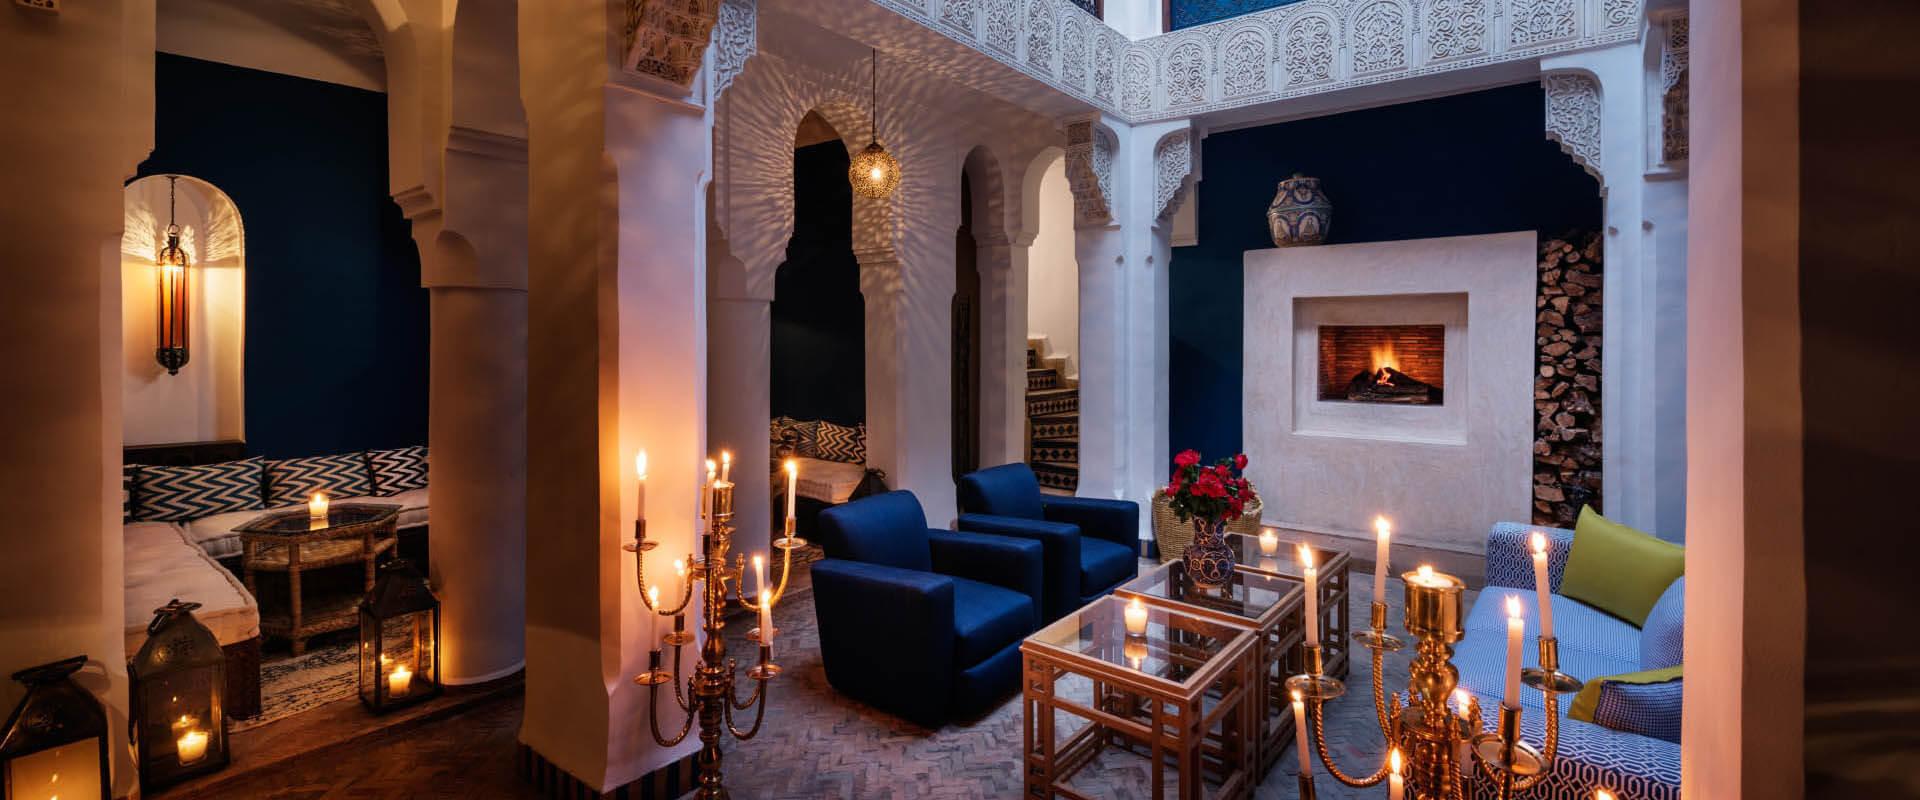 Luxury boutique hotel marrakech riad les yeux bleus for Luxury riad in marrakech